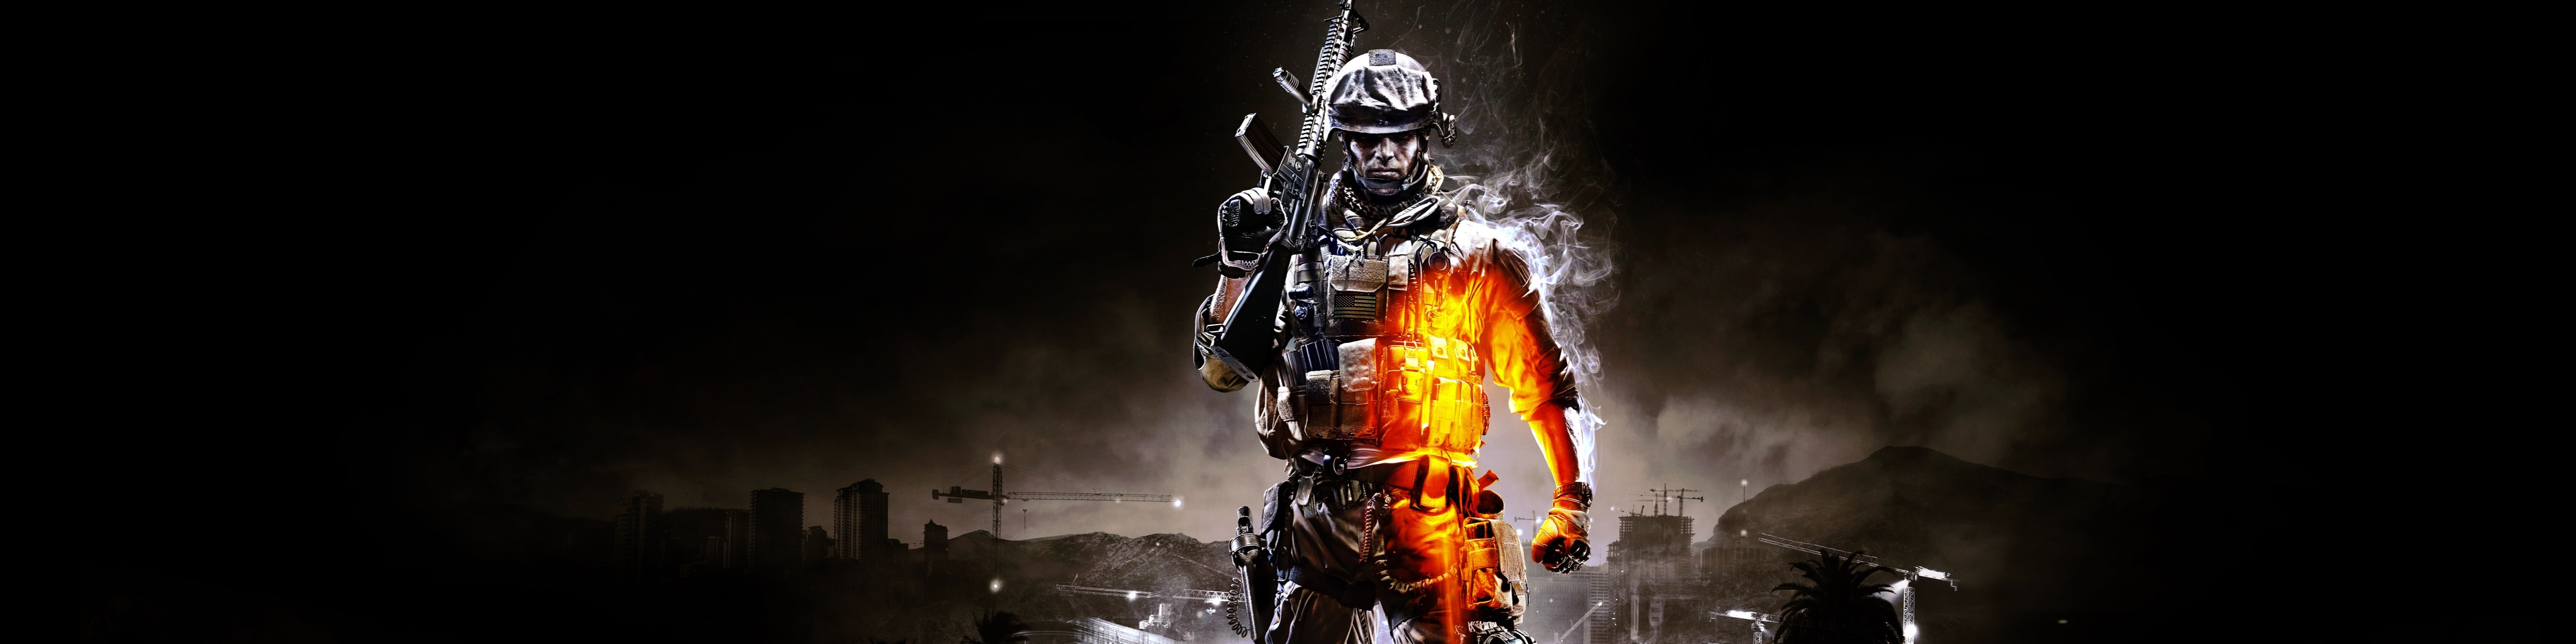 Battlefield 3™ Back to Karkand Expansion Pack